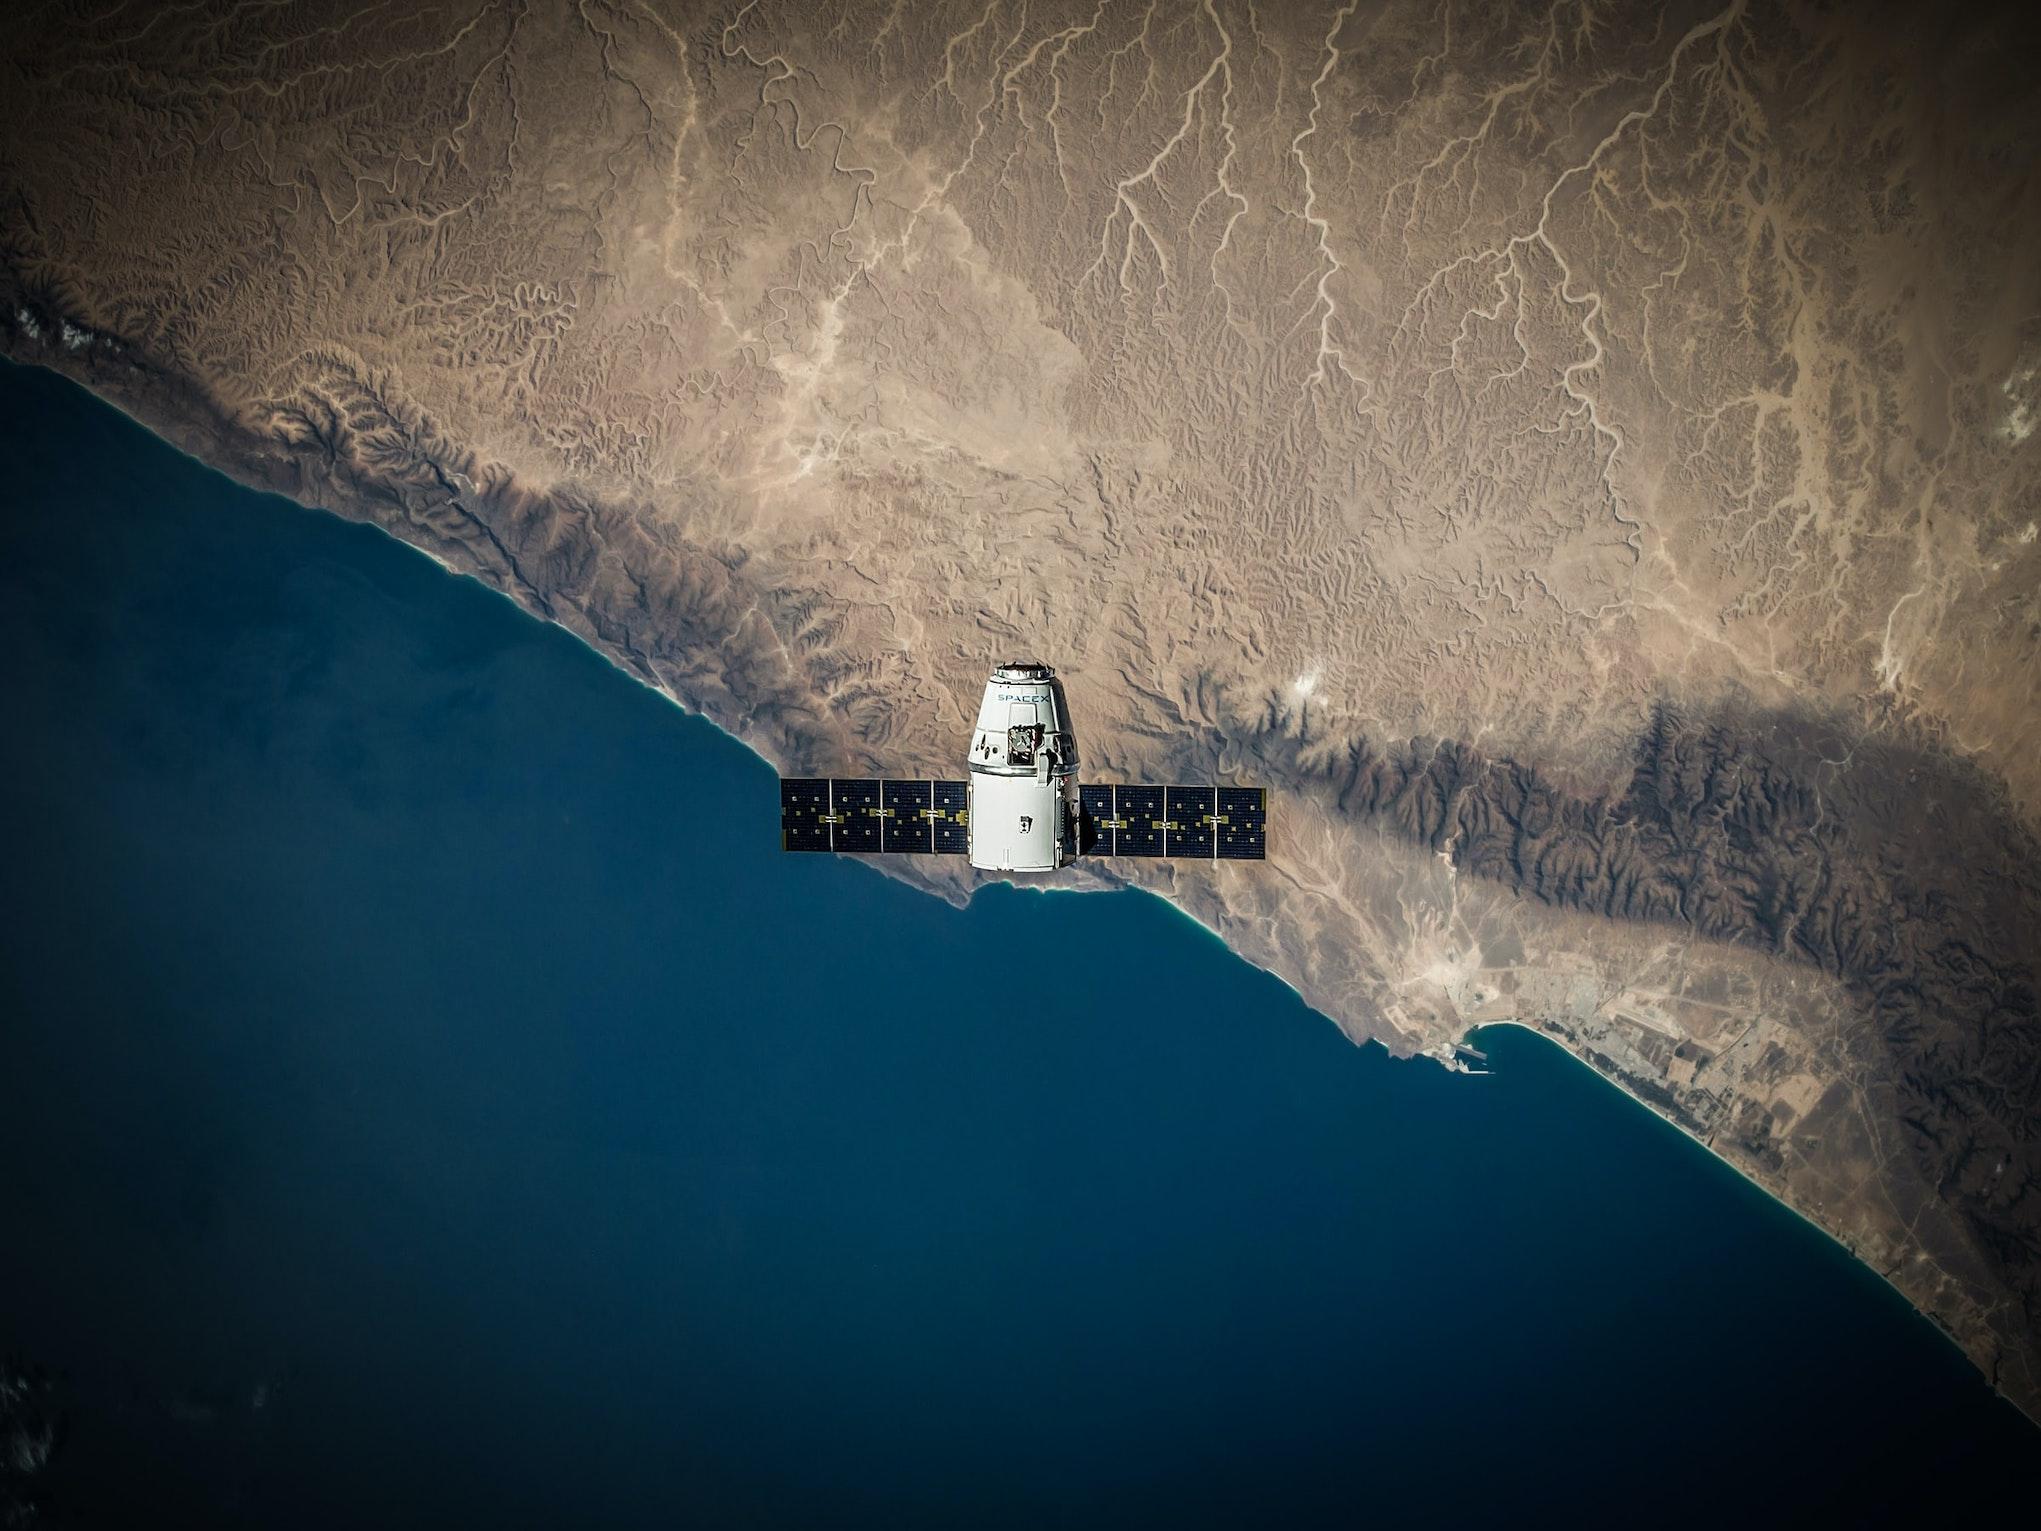 Image credit: SpaceX/Unsplash